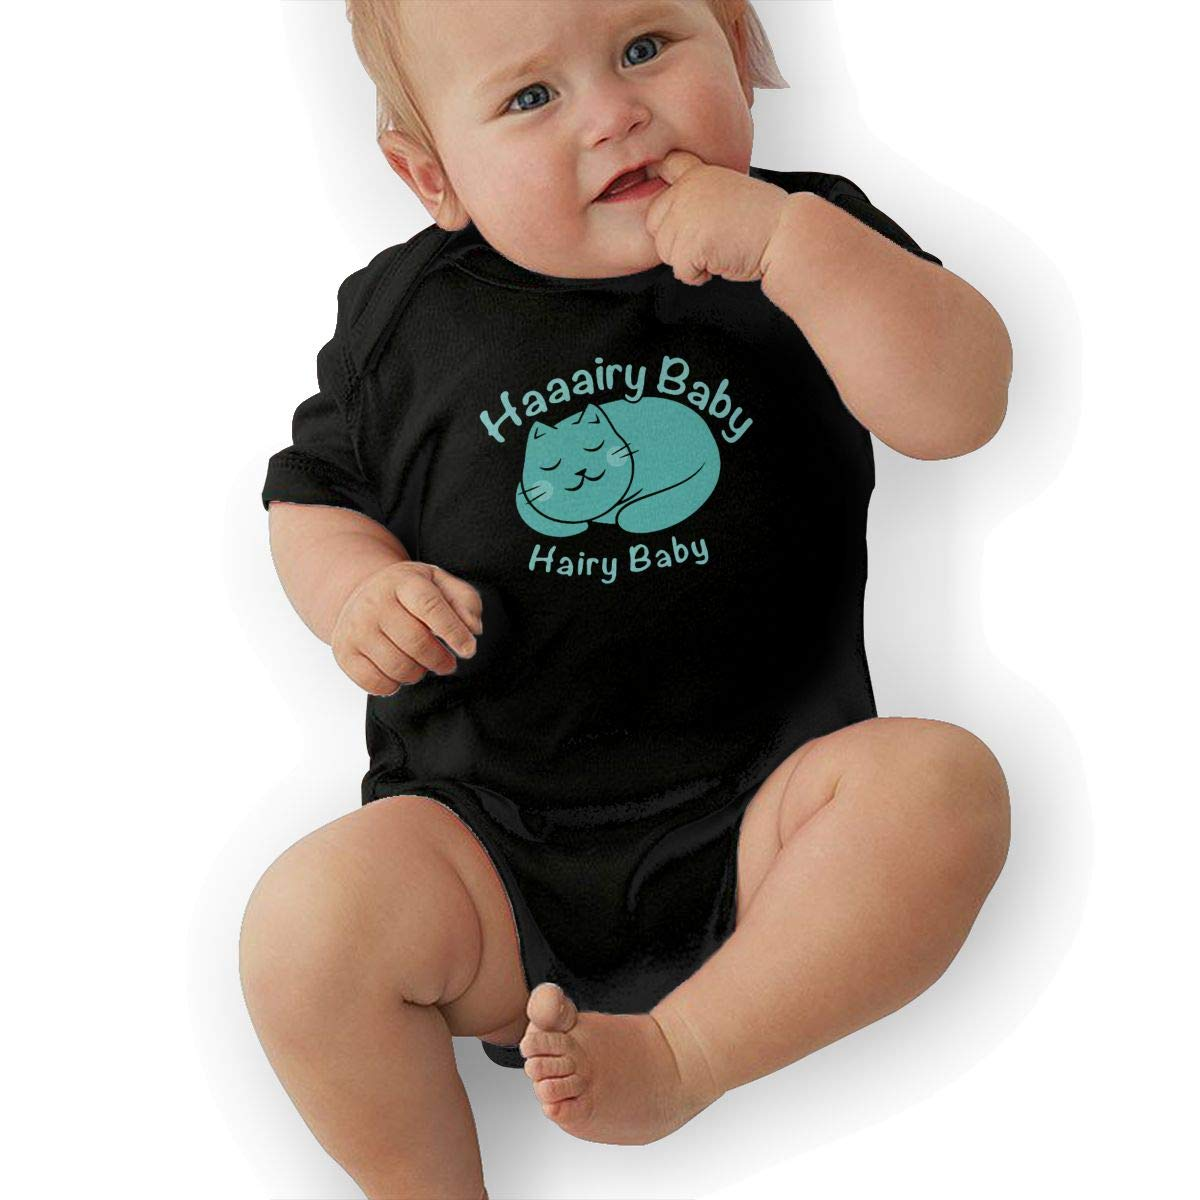 Mri-le2 Newborn Baby Short Sleeve Jersey Bodysuit Hairy Baby Toddler Jumpsuit